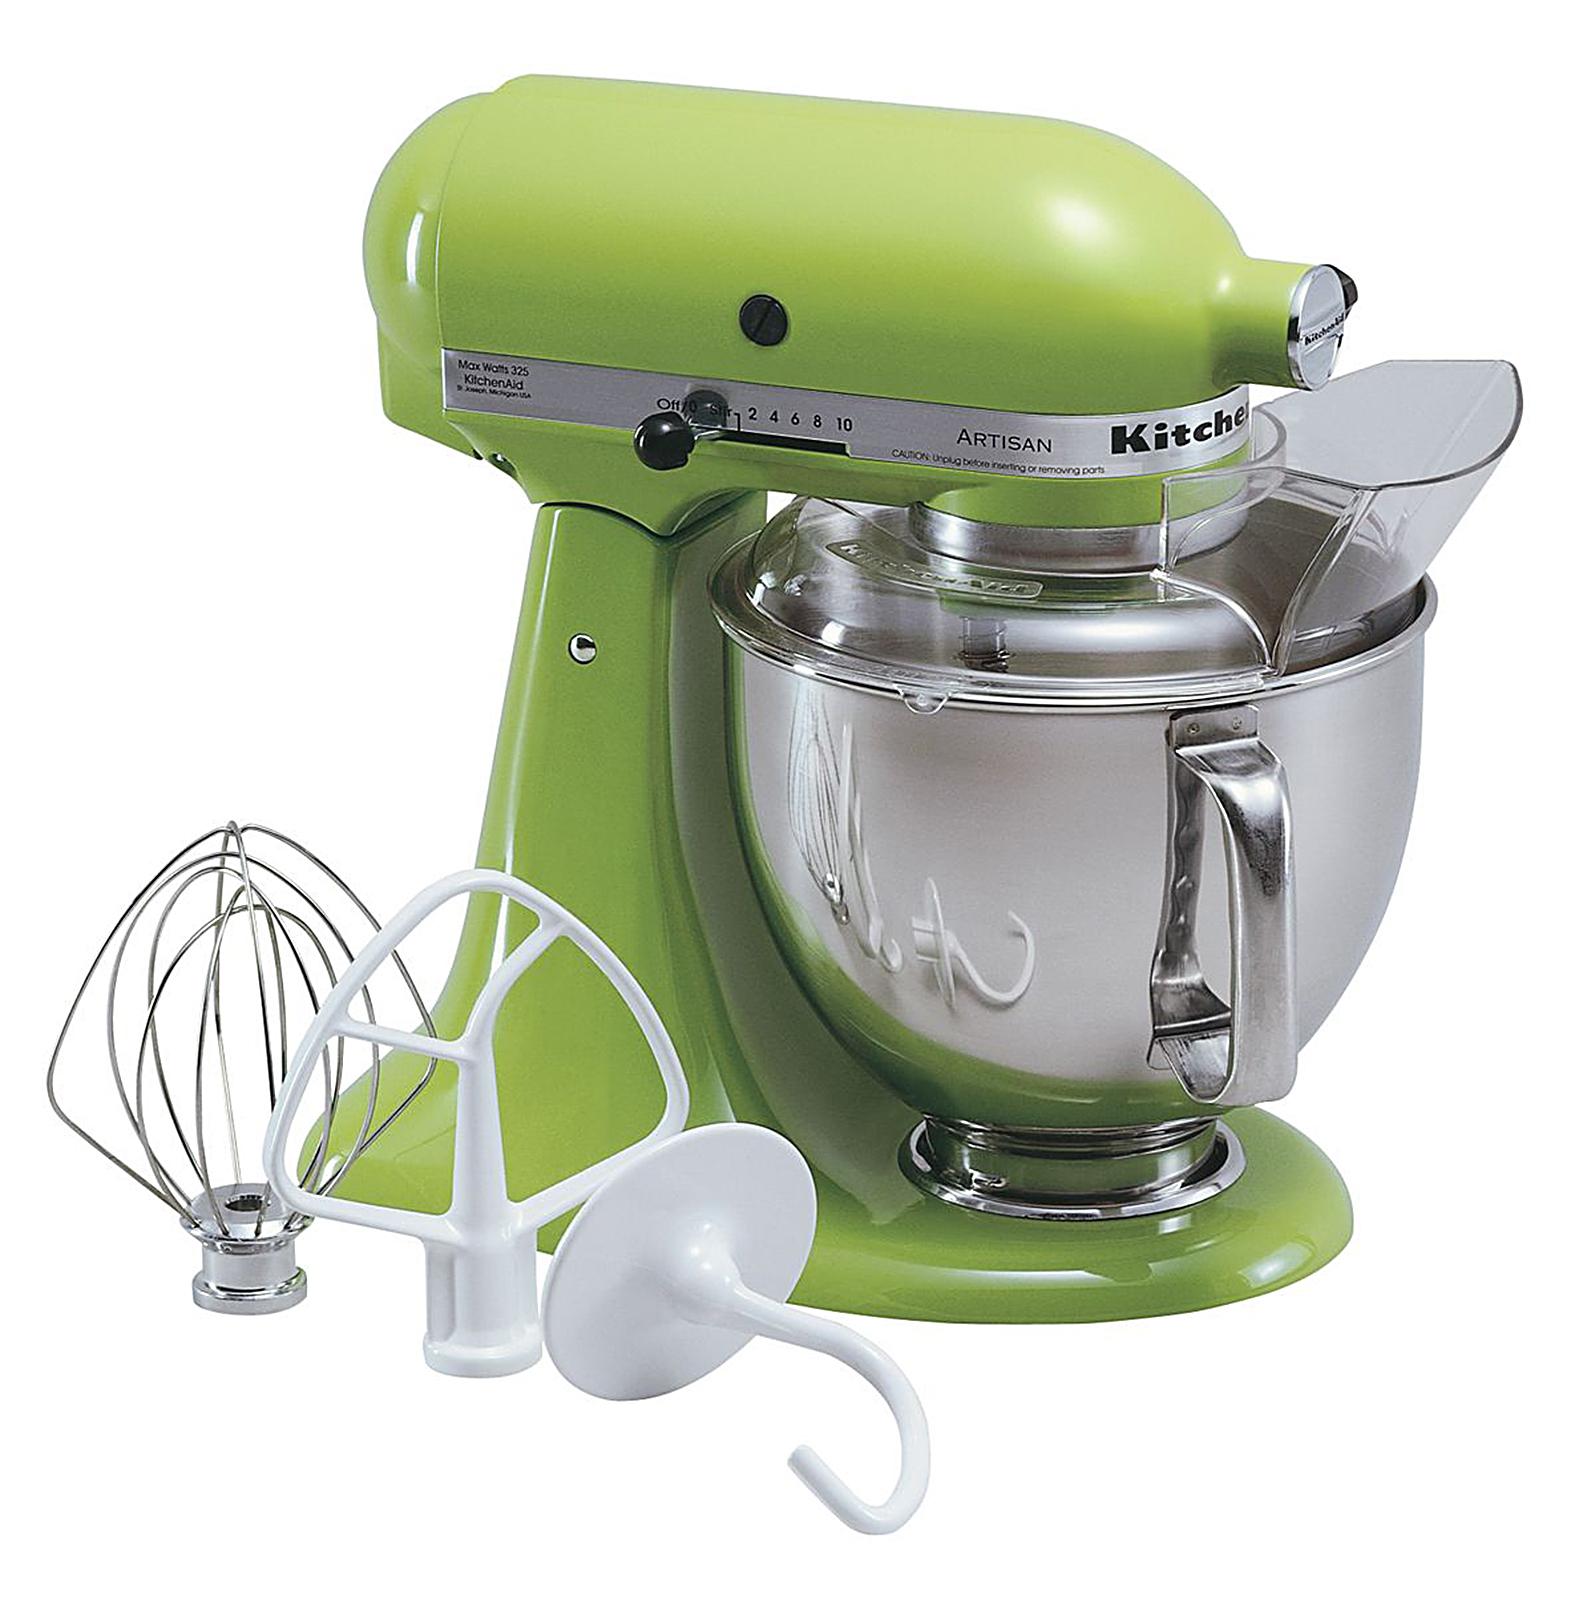 KitchenAid KSM150PSGA Artisan® Series Green Apple 5 Quart Stand Mixer